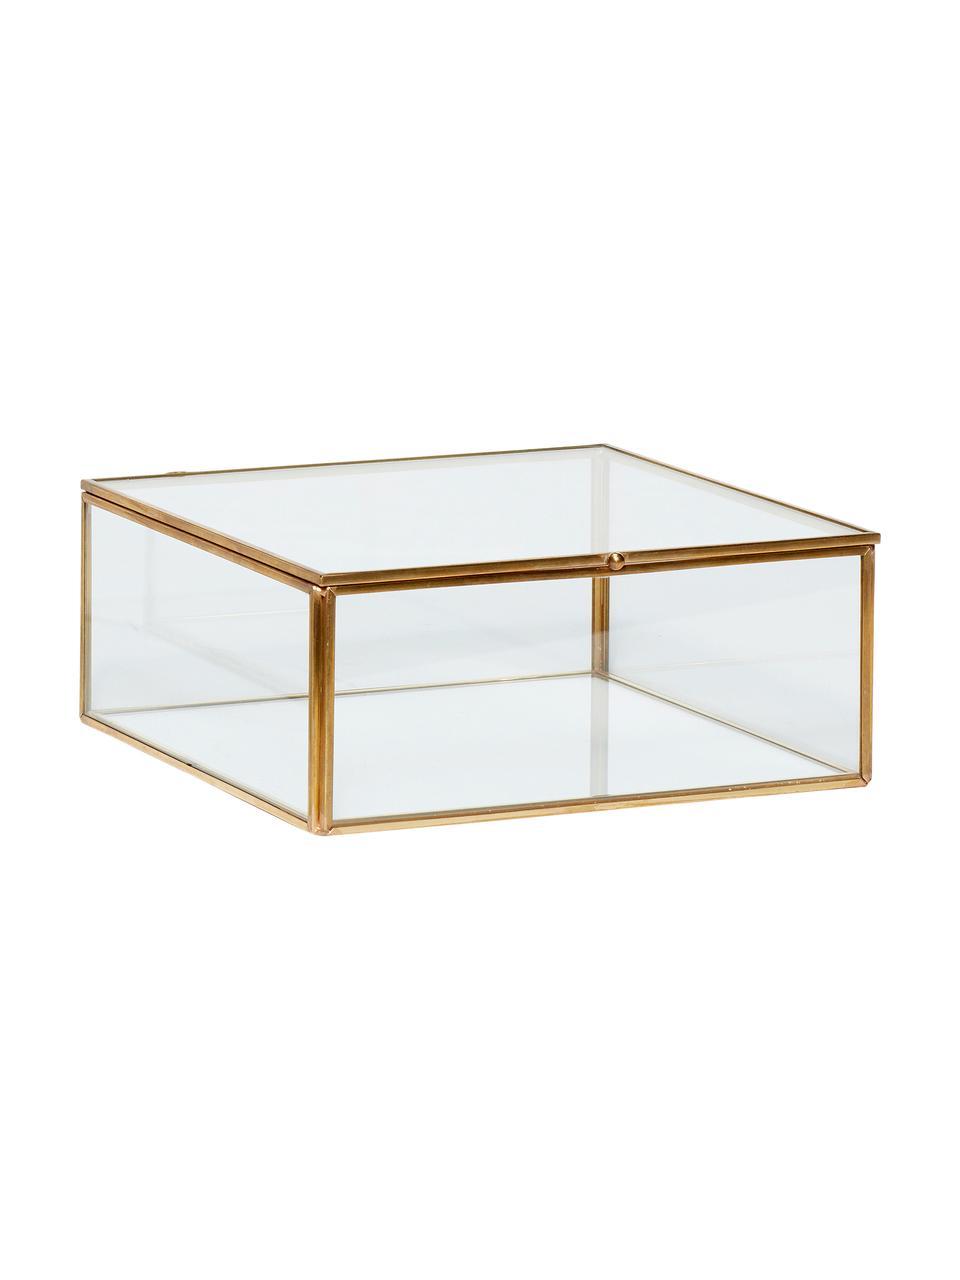 Set 2 scatole Karie, Cornice: ottone, Scatola: vetro, Ottone trasparente, Set in varie misure